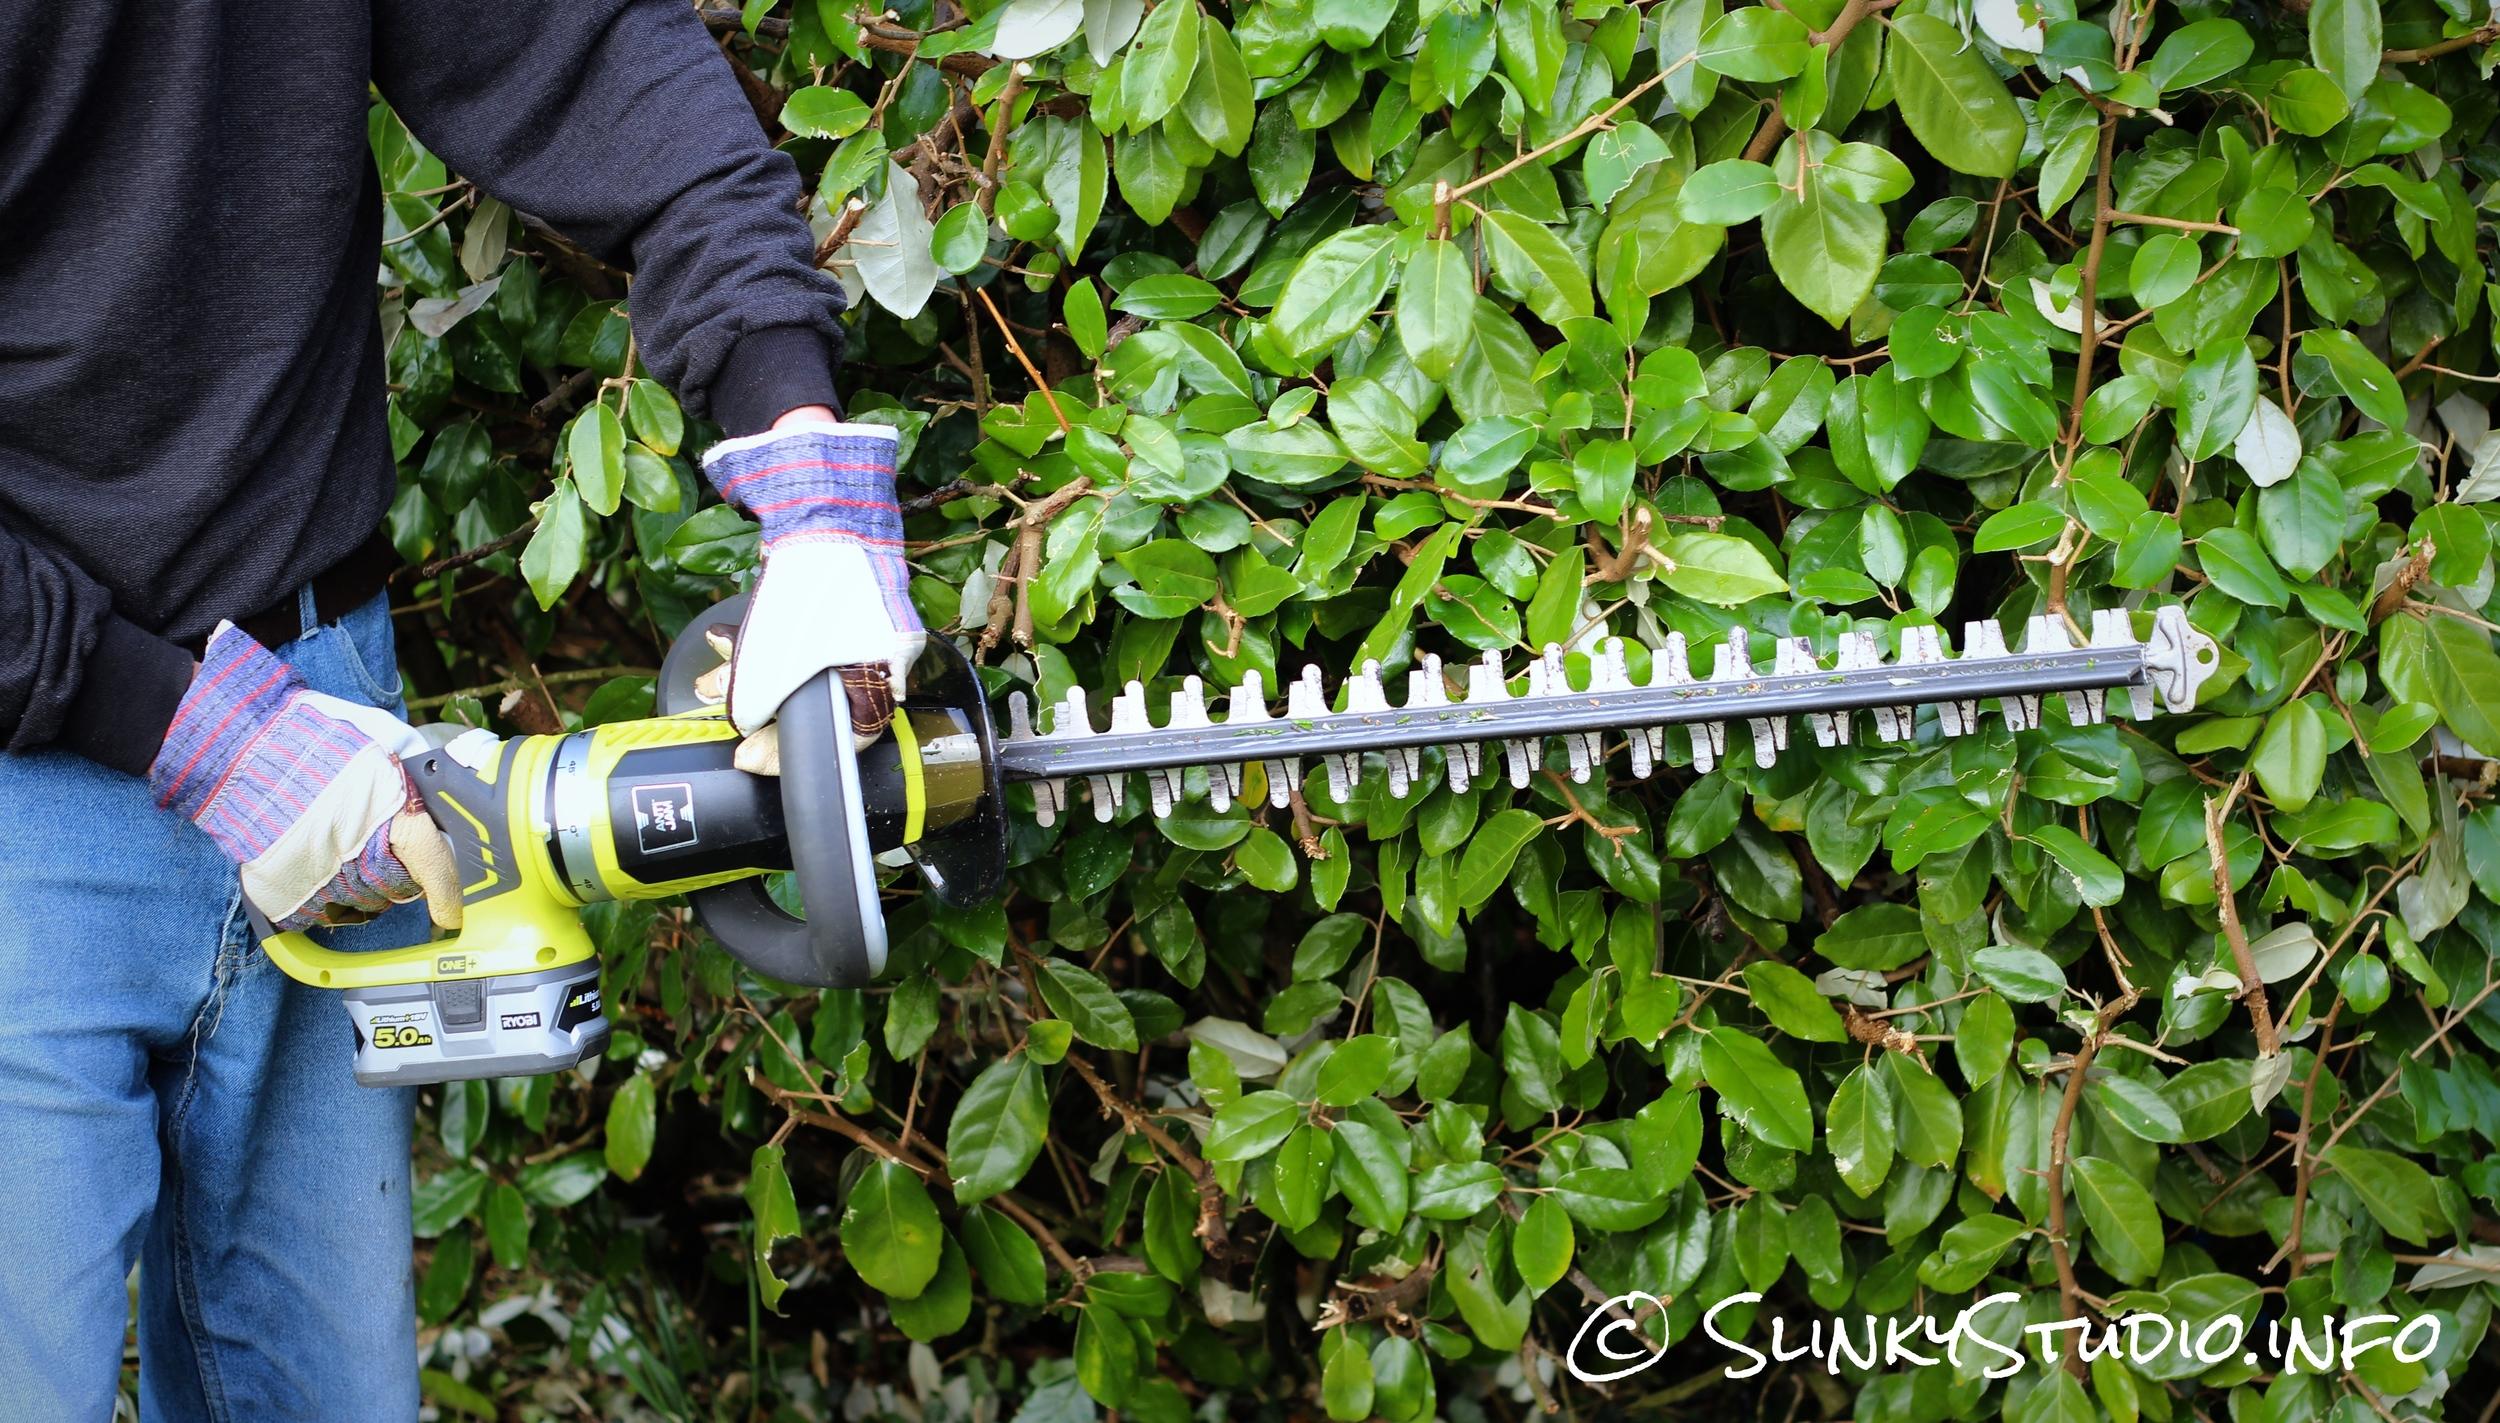 Ryobi One+ Hedge Trimmer Handle Twisted Cutting Hedge Downwards.jpg